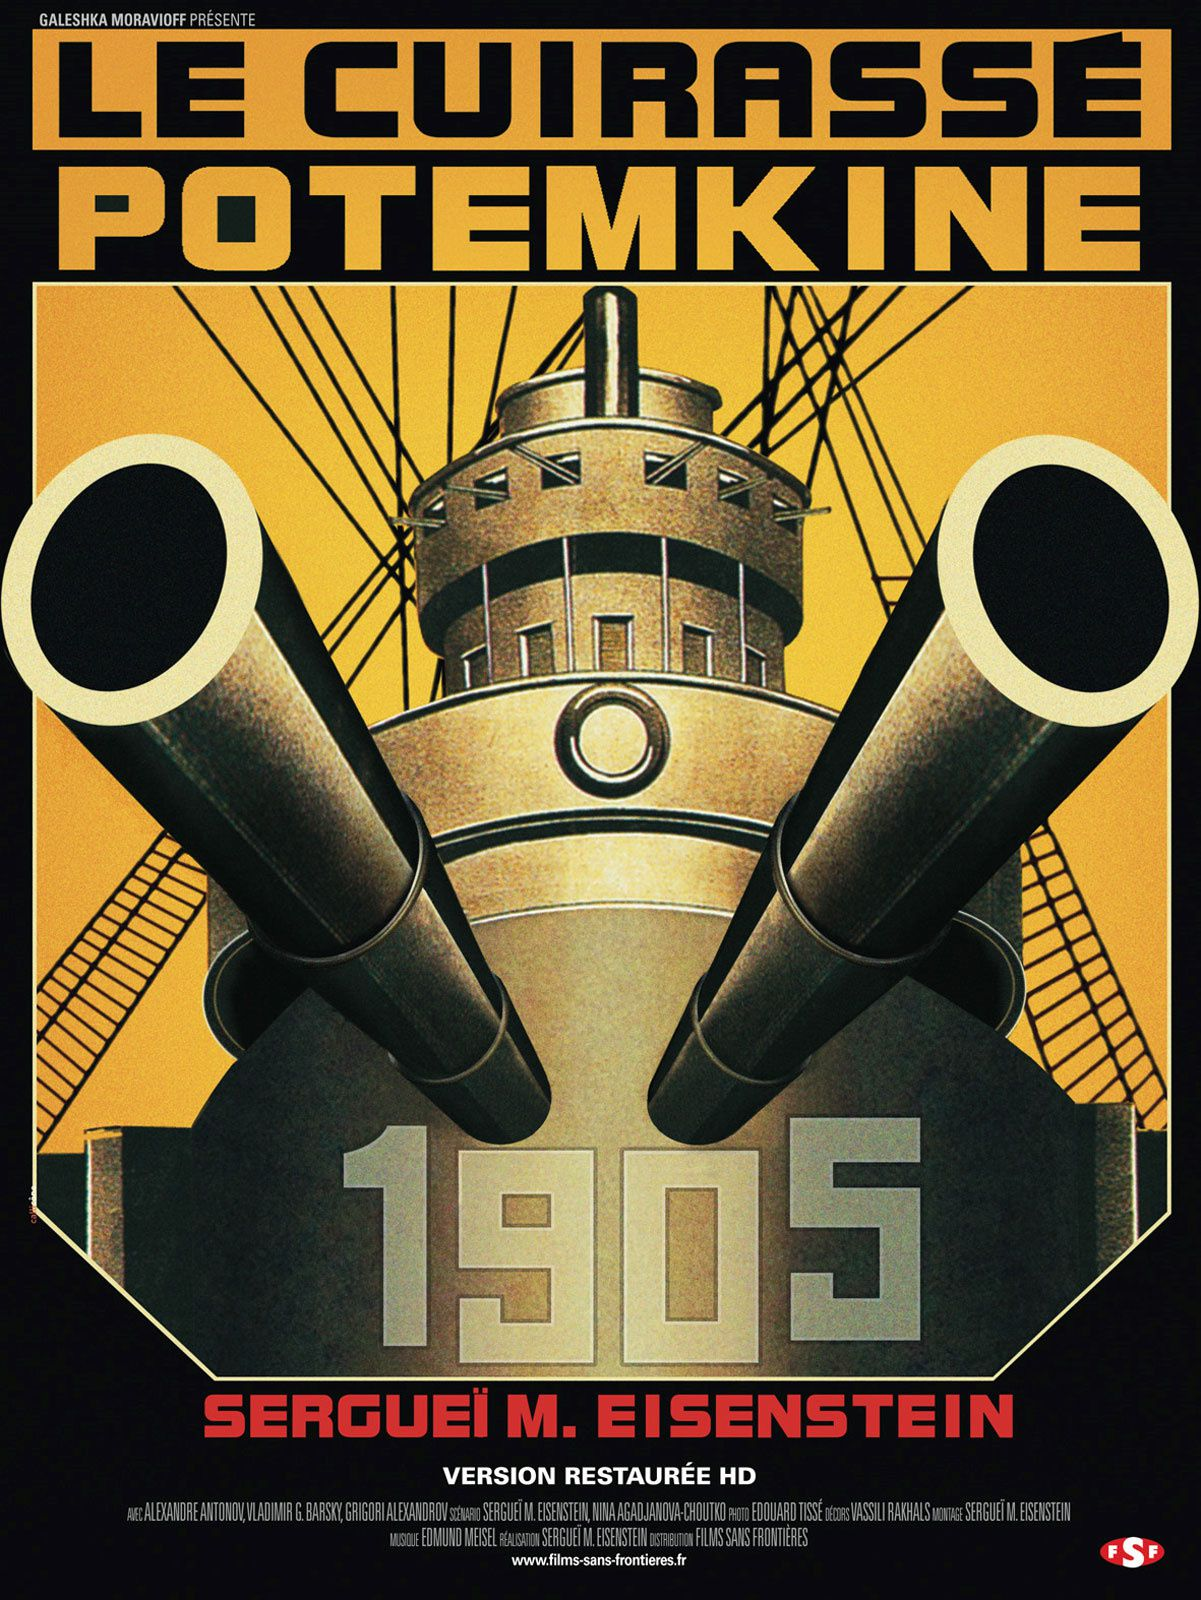 Ce soir, j'aime Potemkine... Pardon Poutou